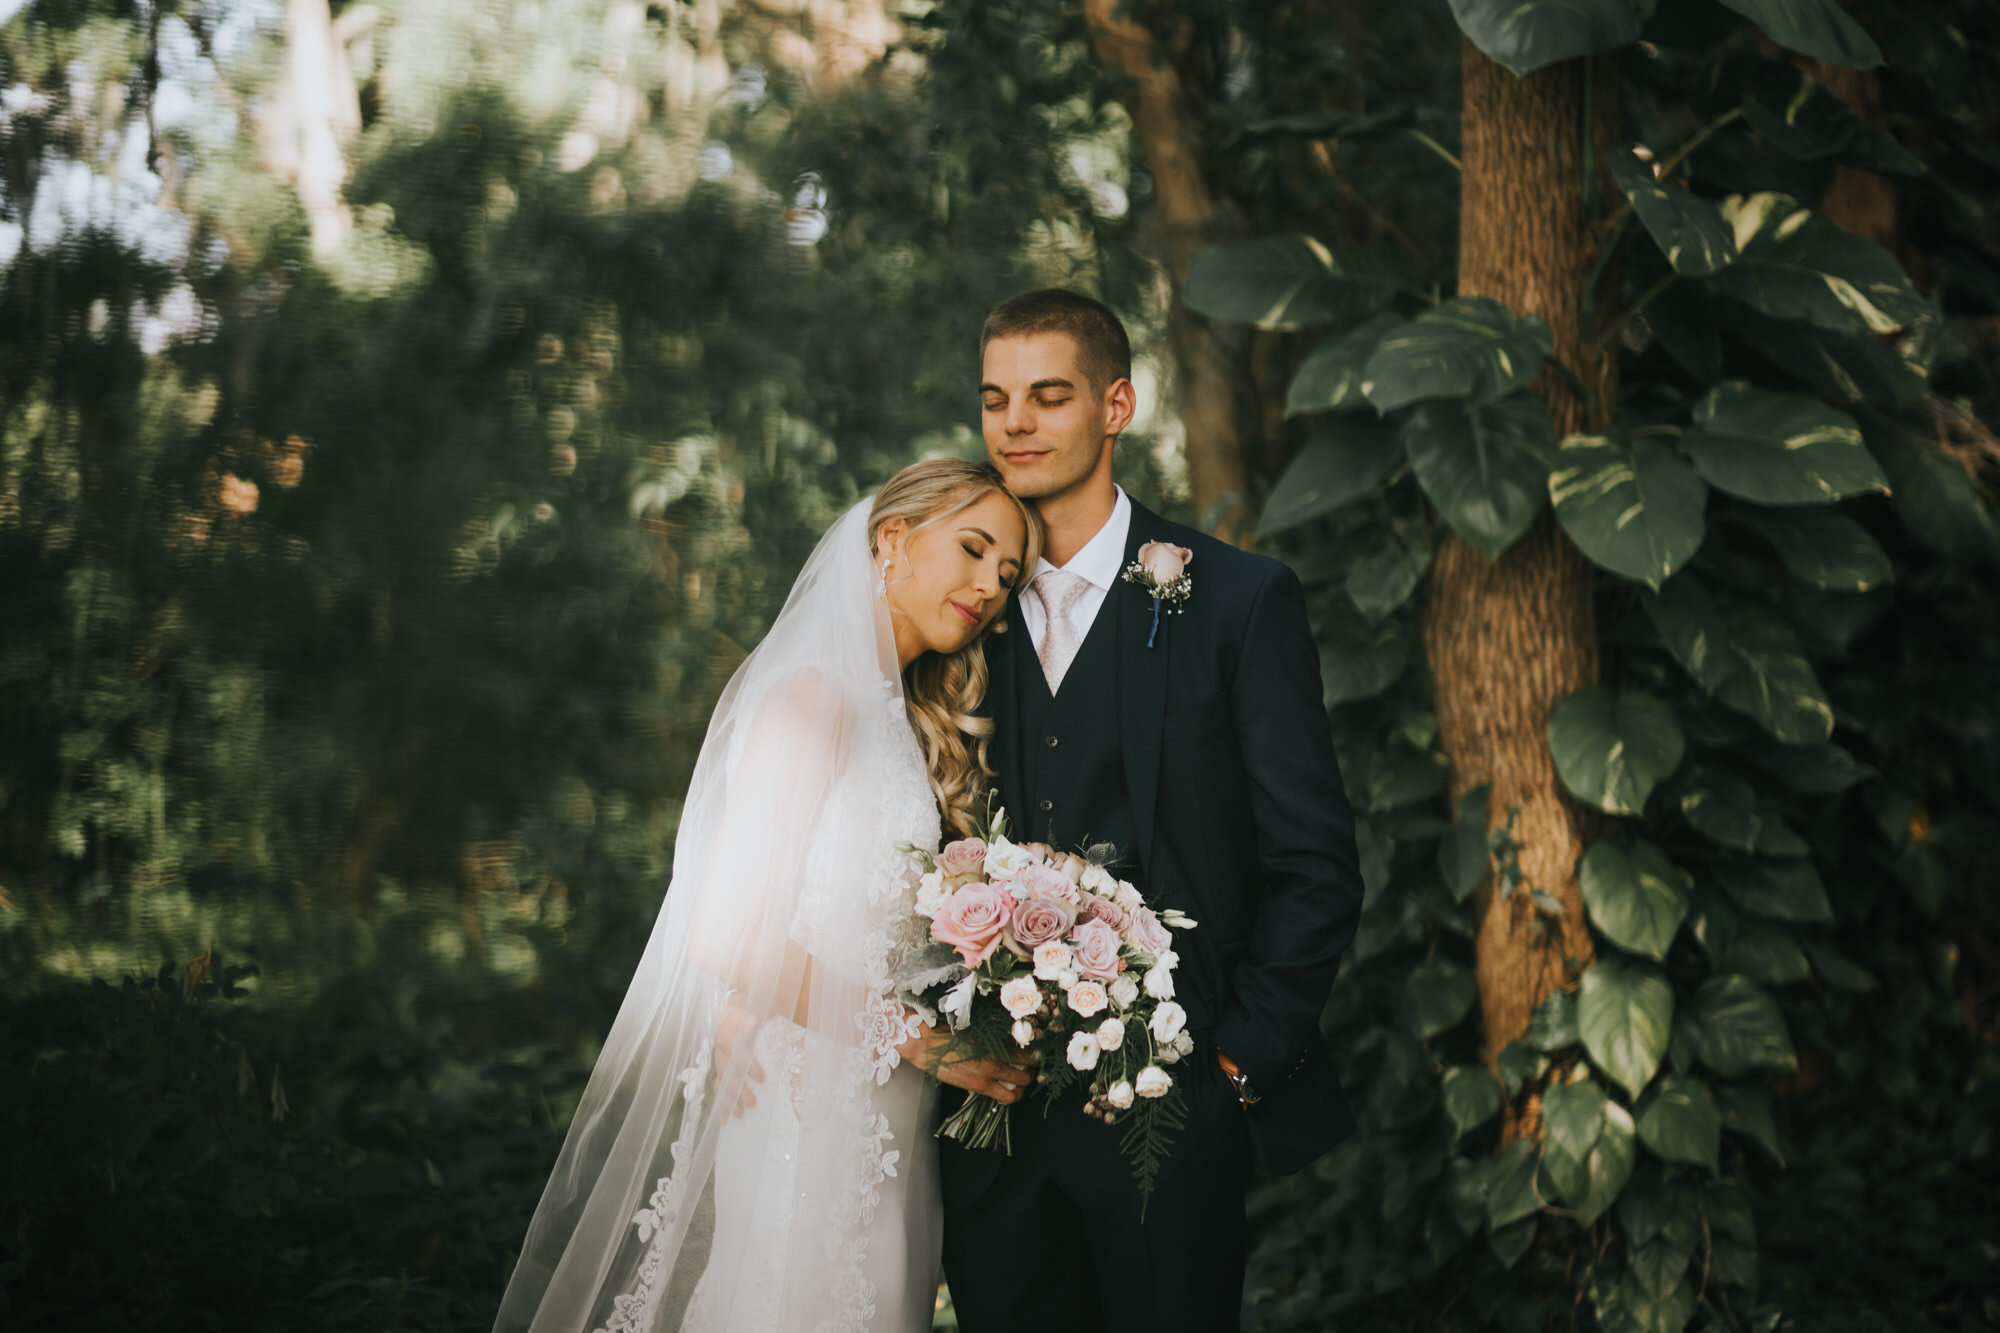 342Sean_Emily_Wedding_3-30-19.jpg